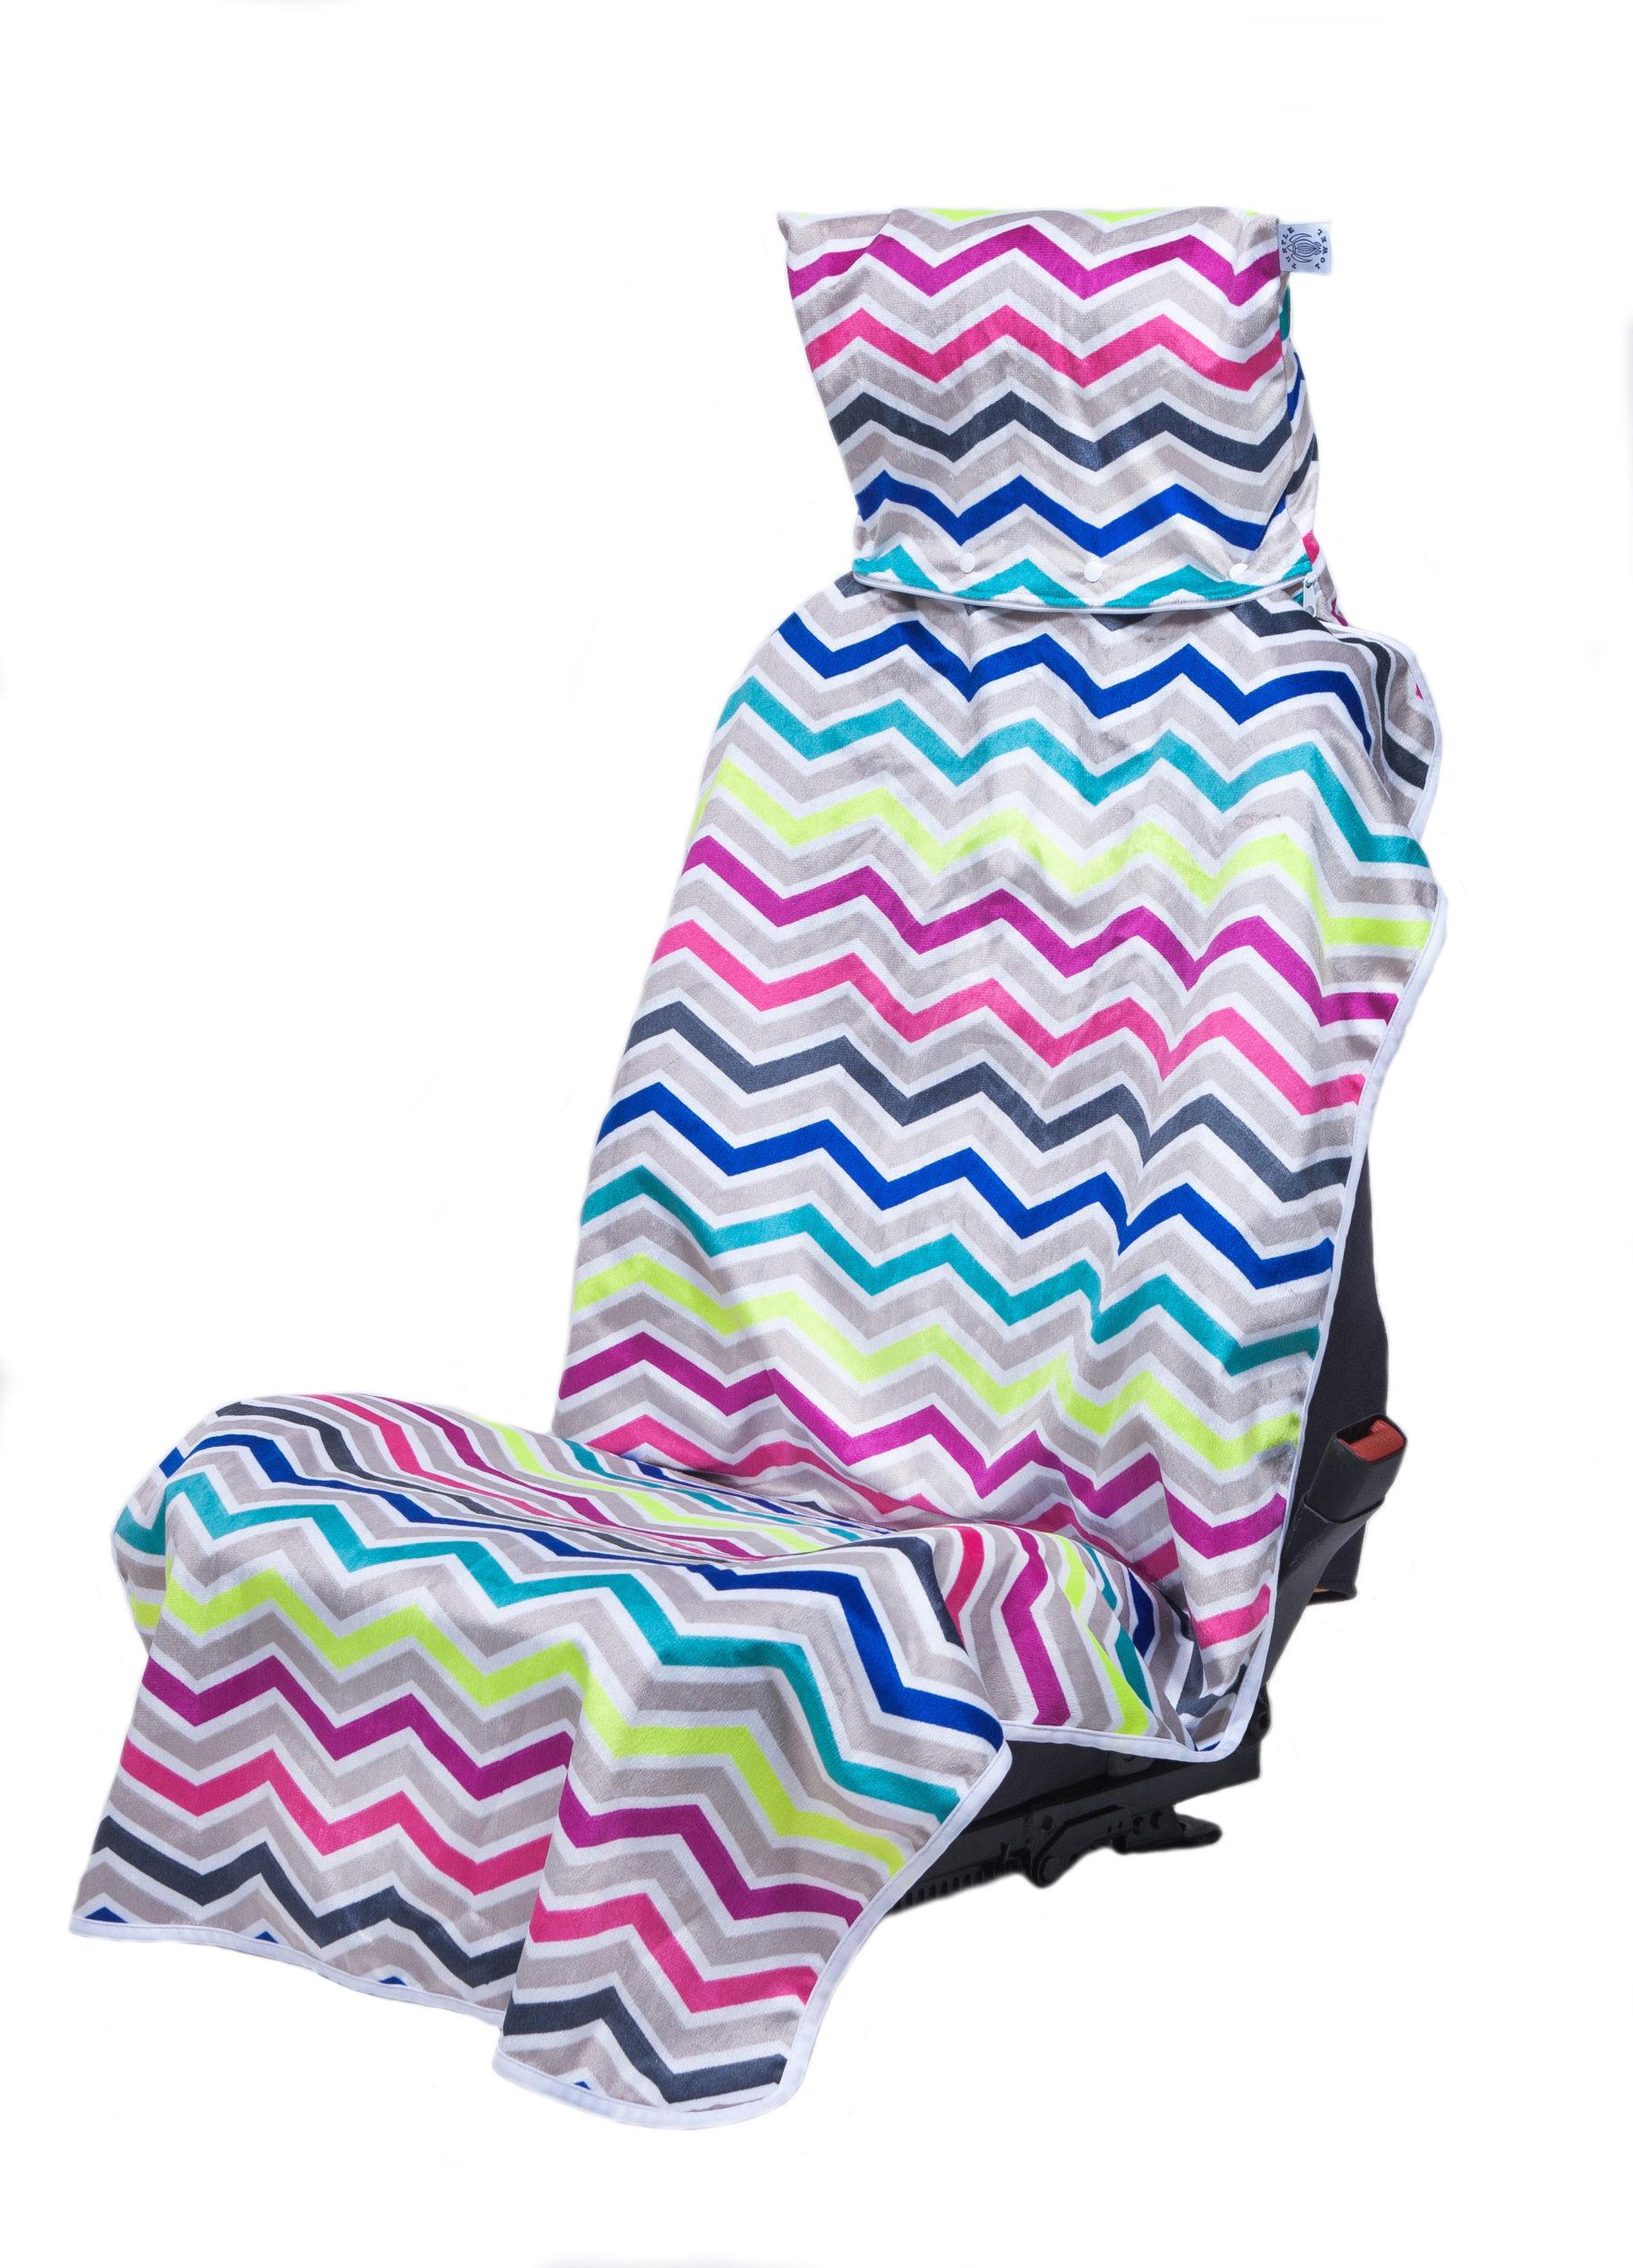 Fabulous Turtle Towels! ZP29